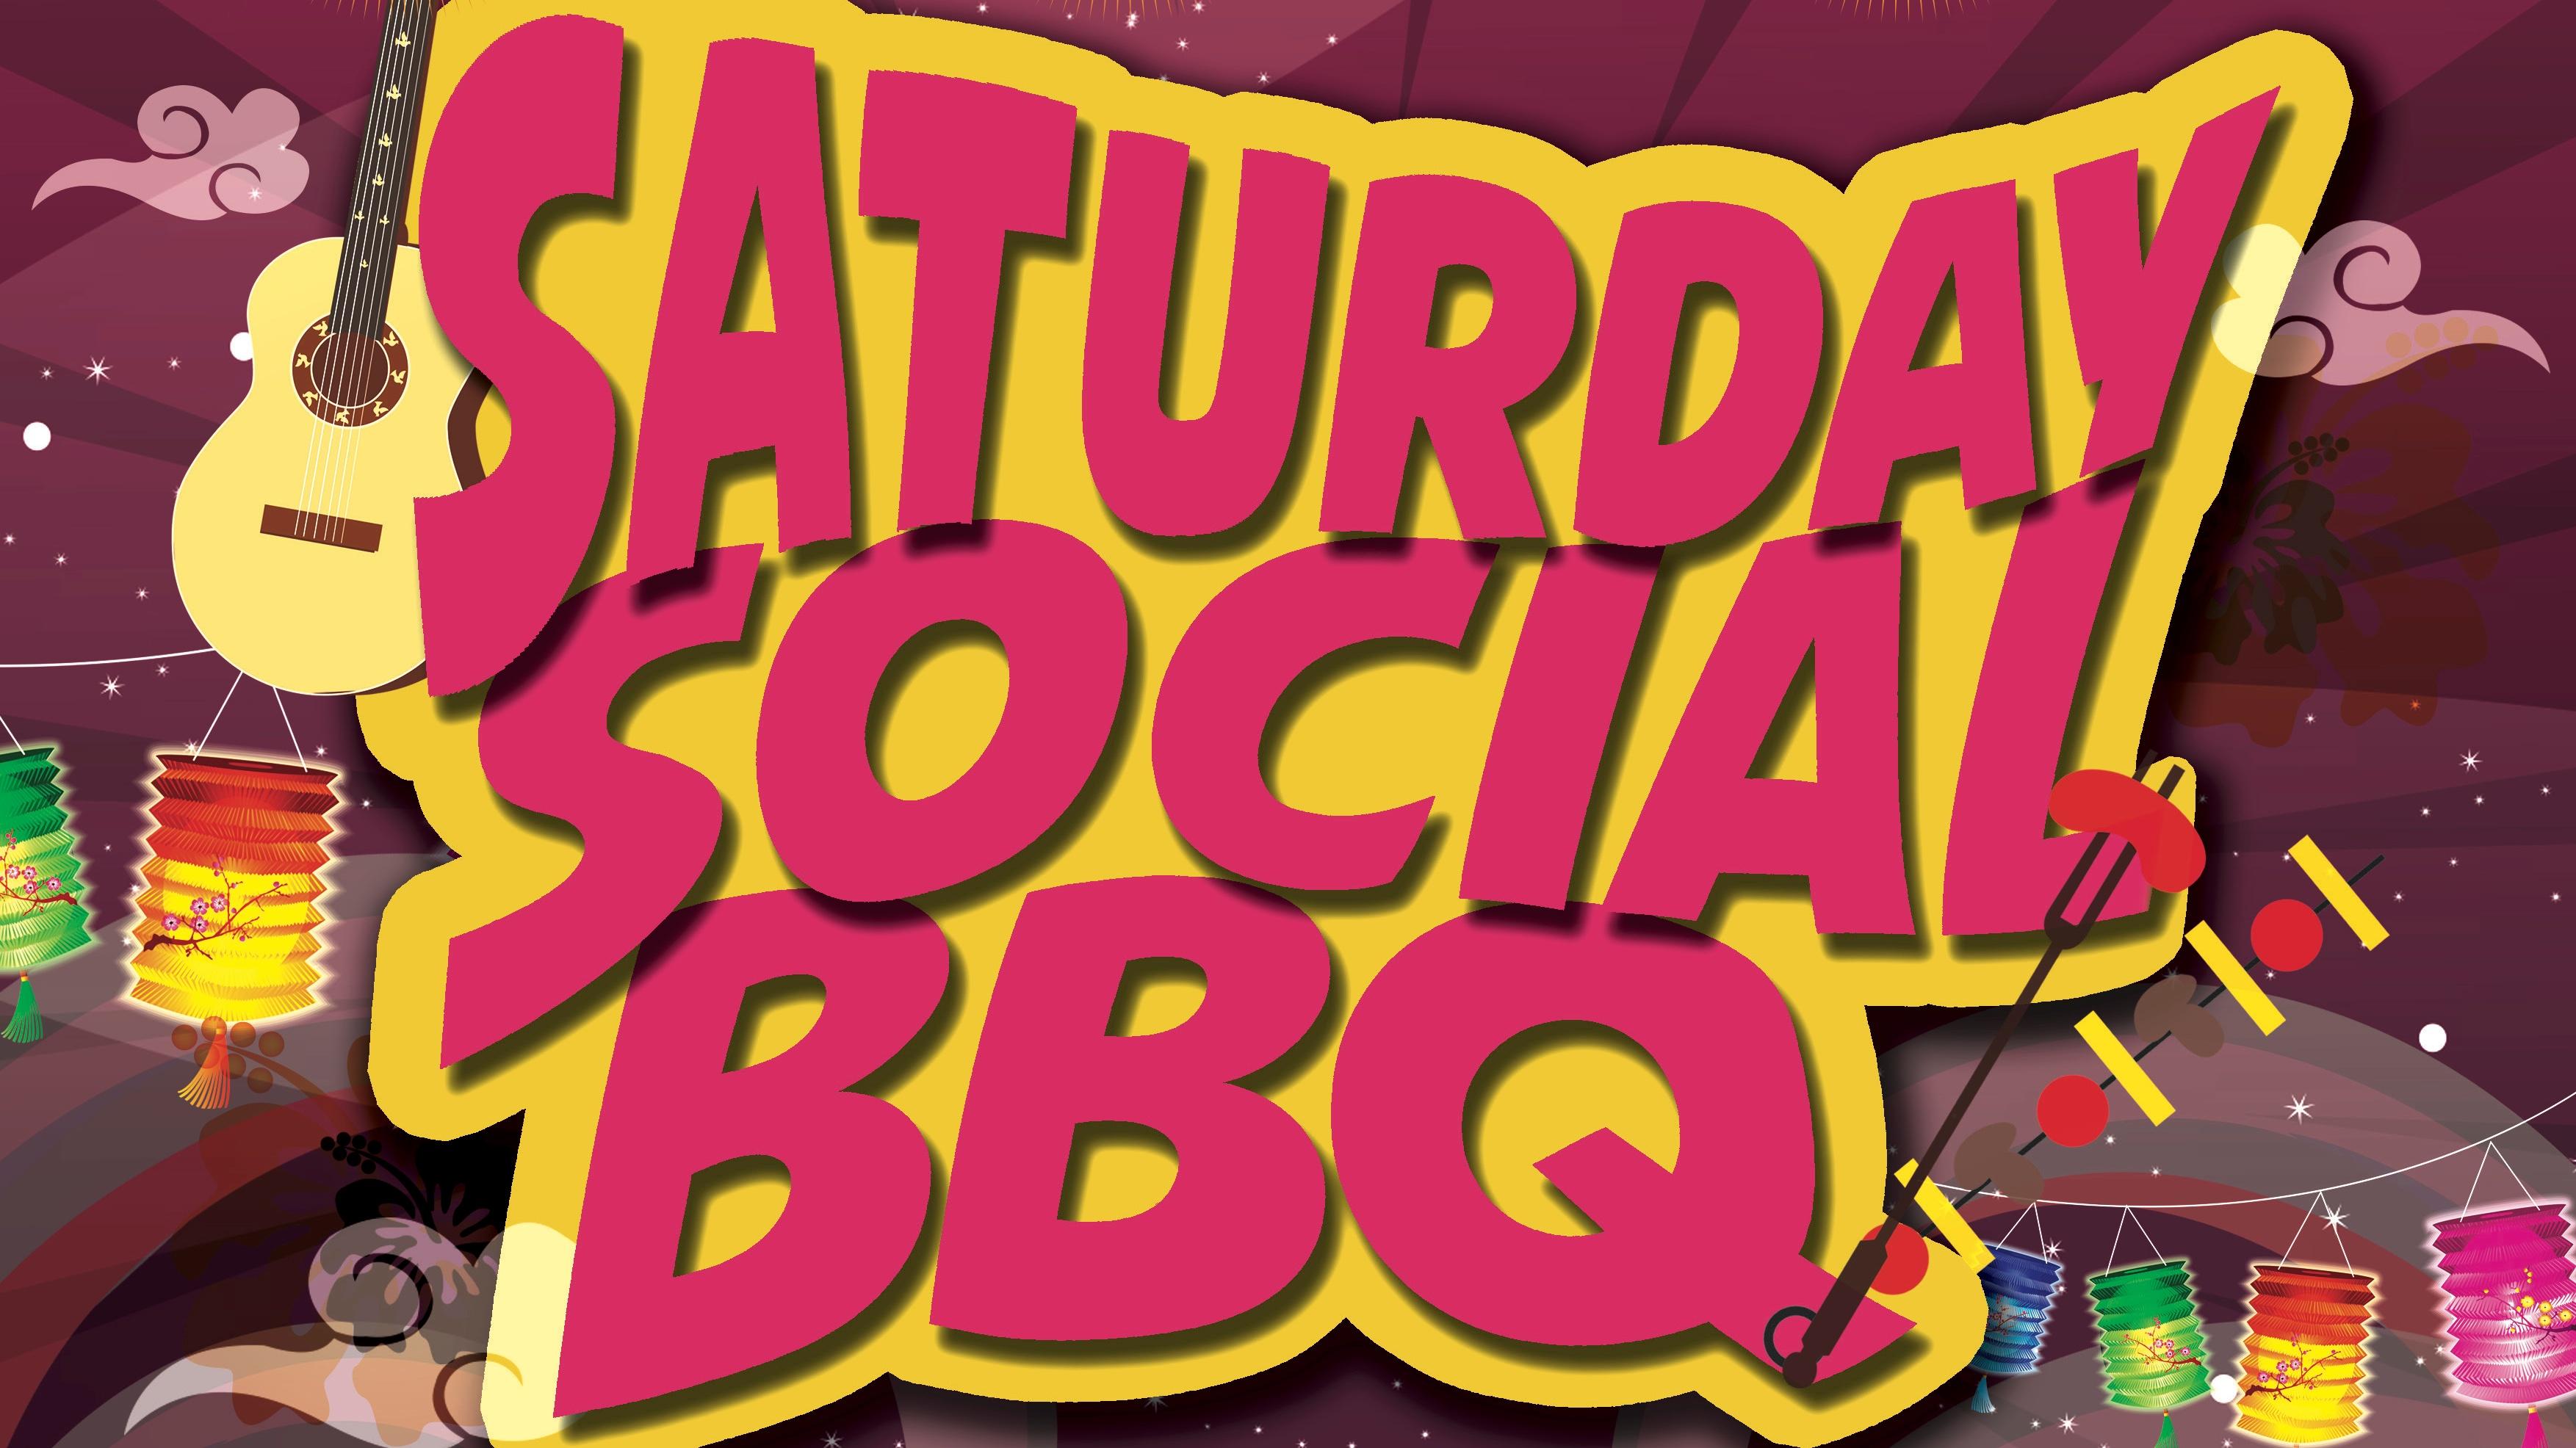 Saturday Social BBQ